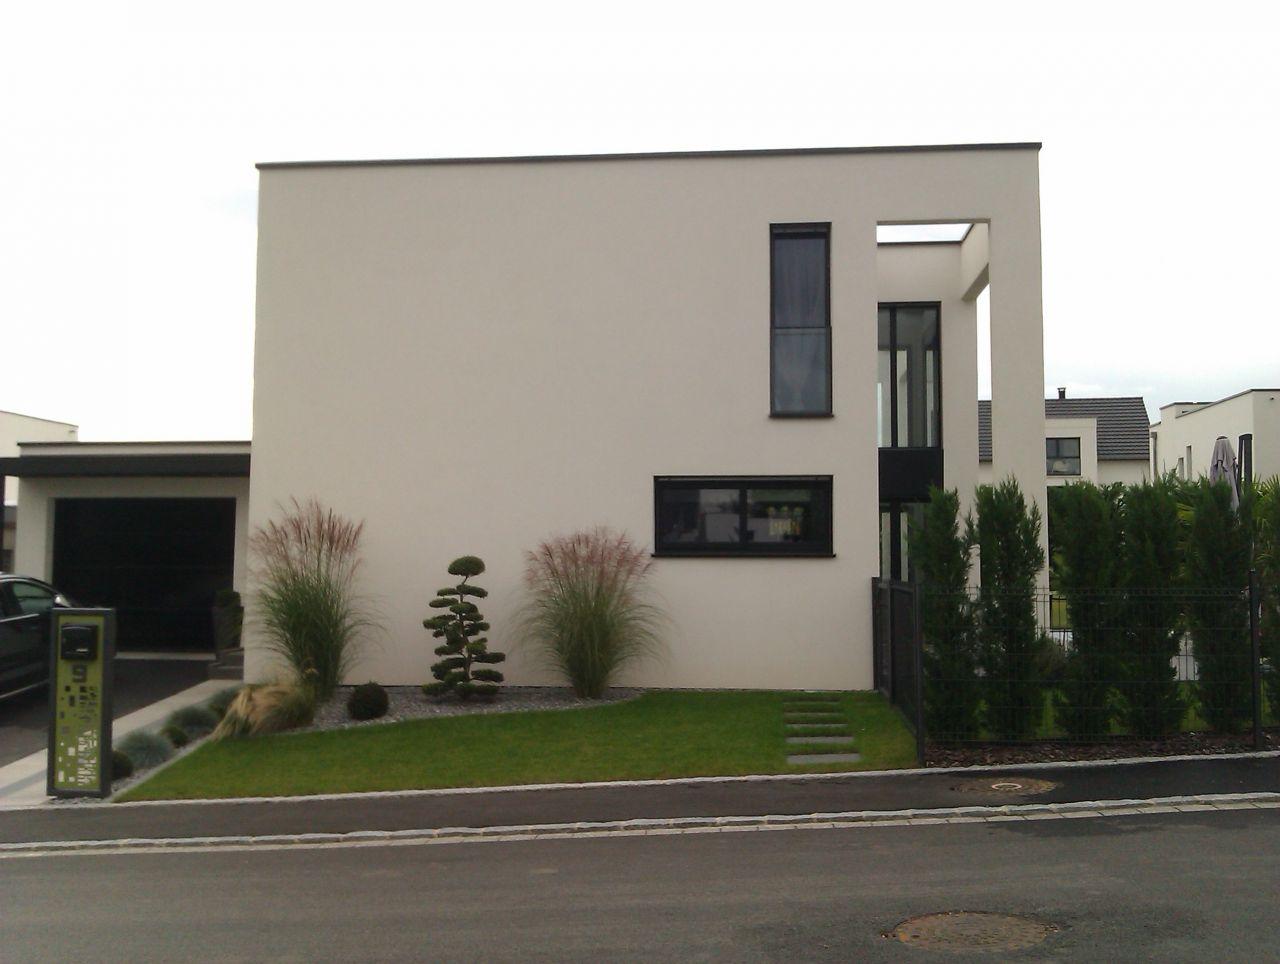 Arbre - Sierentz (Haut Rhin - 68) - octobre 2014